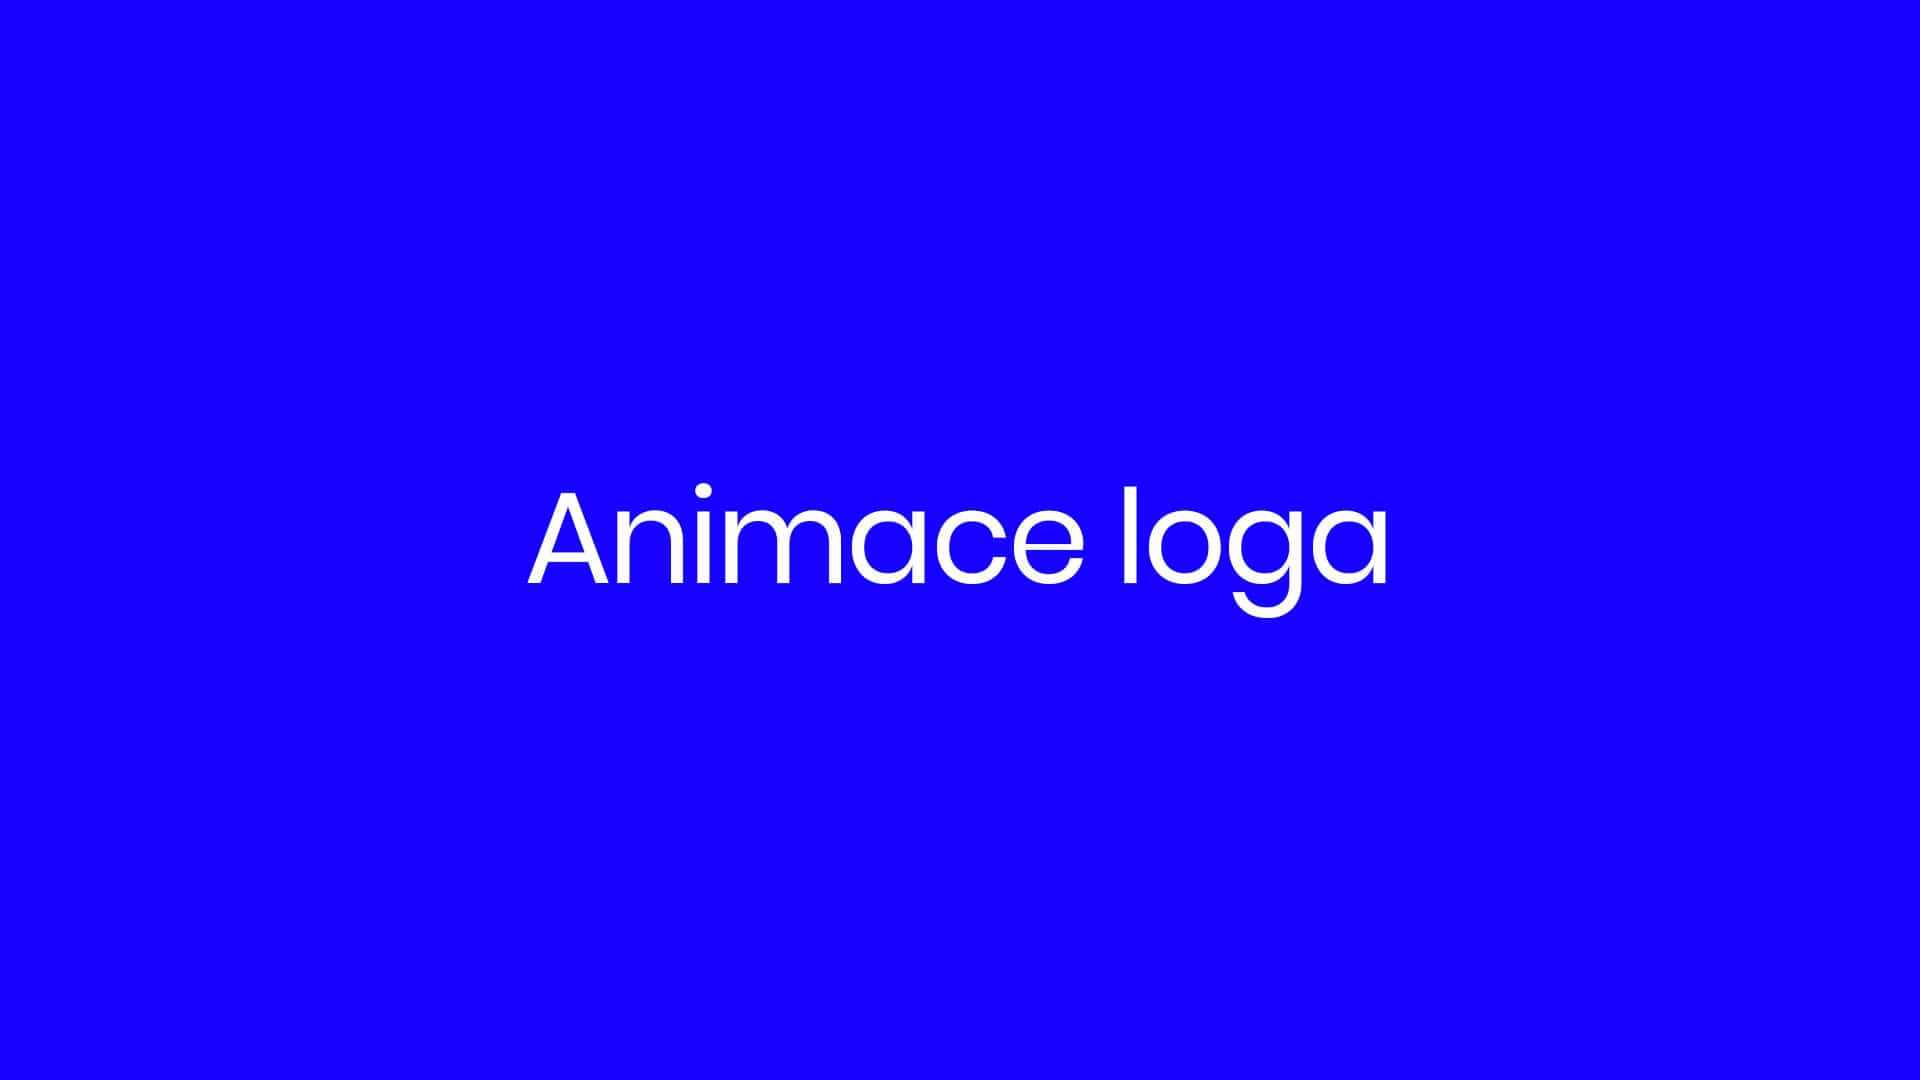 15. díl - animace loga